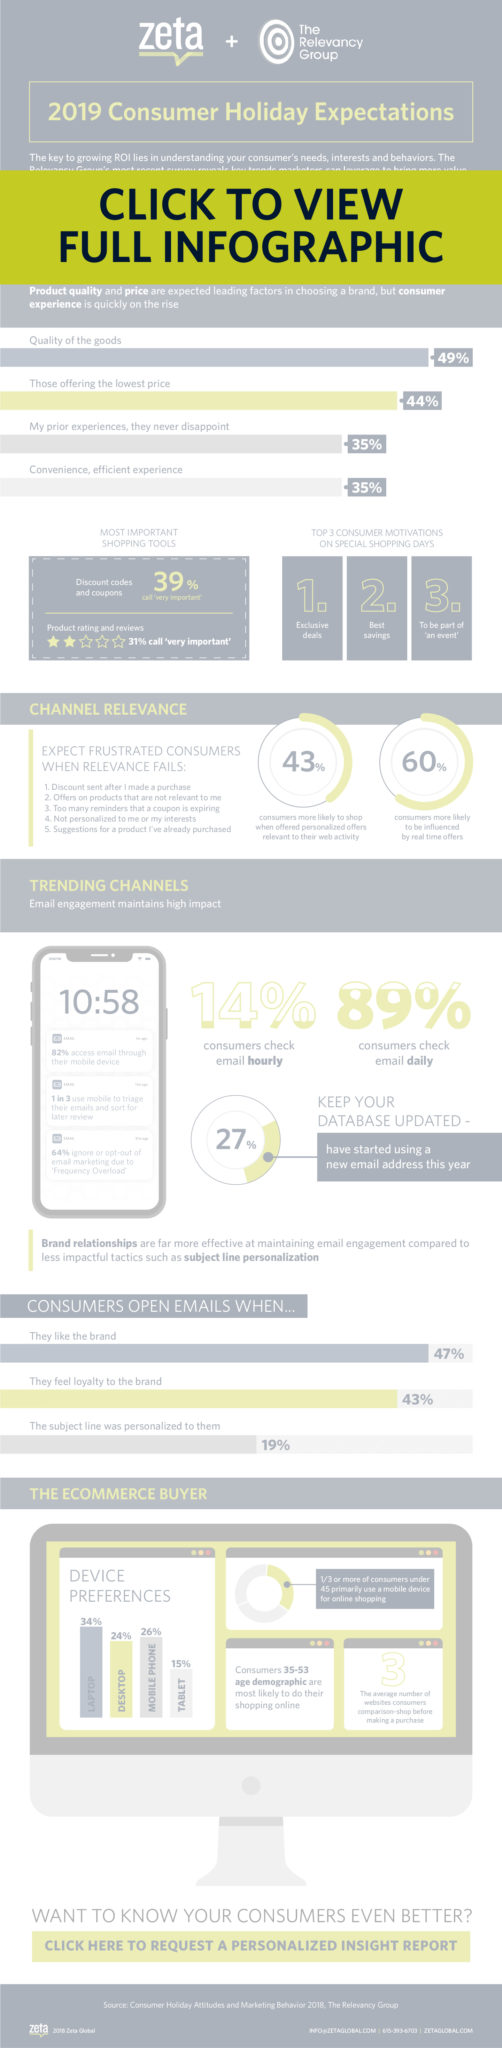 infographic teaser